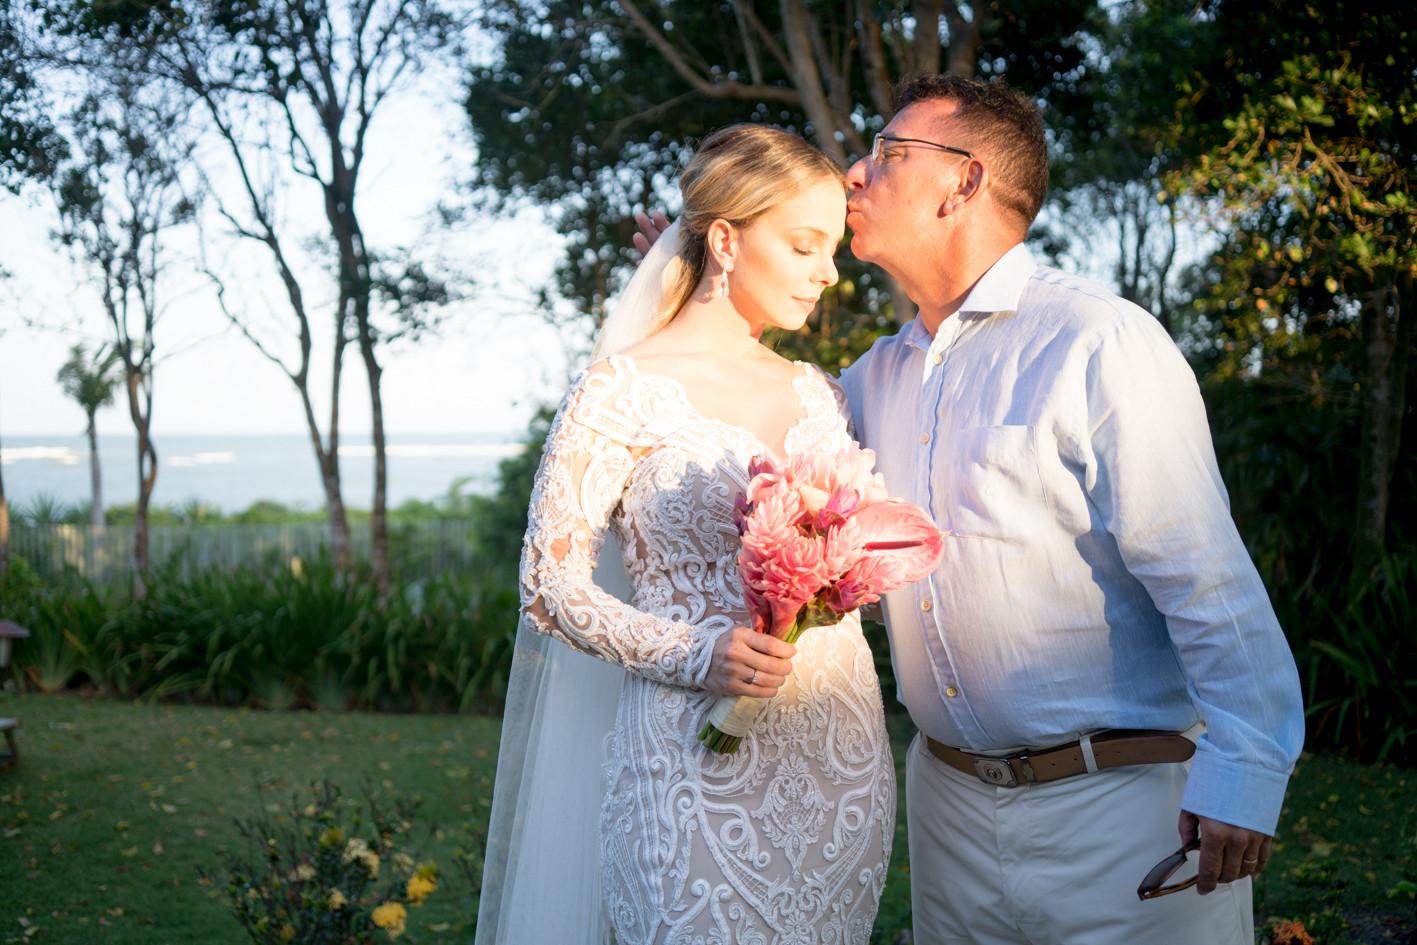 Casamento Taynara e Jadir Itapororoca Villa Trancoso Outubro 21th 2017  Fotografo Karib Ribeiro